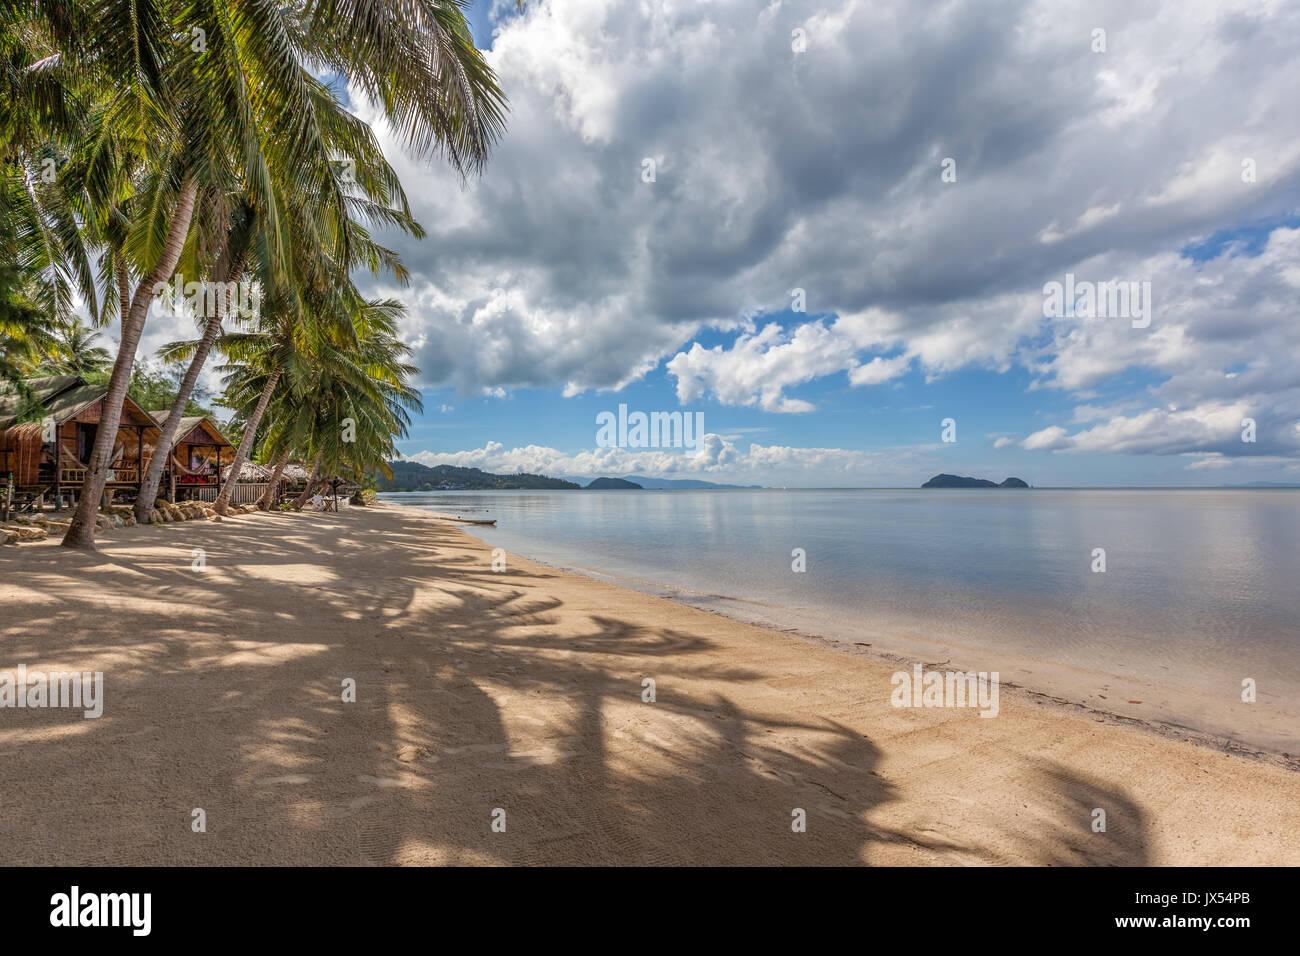 Hin Kong Beach Koh Phangan island Thailand Stock Photo